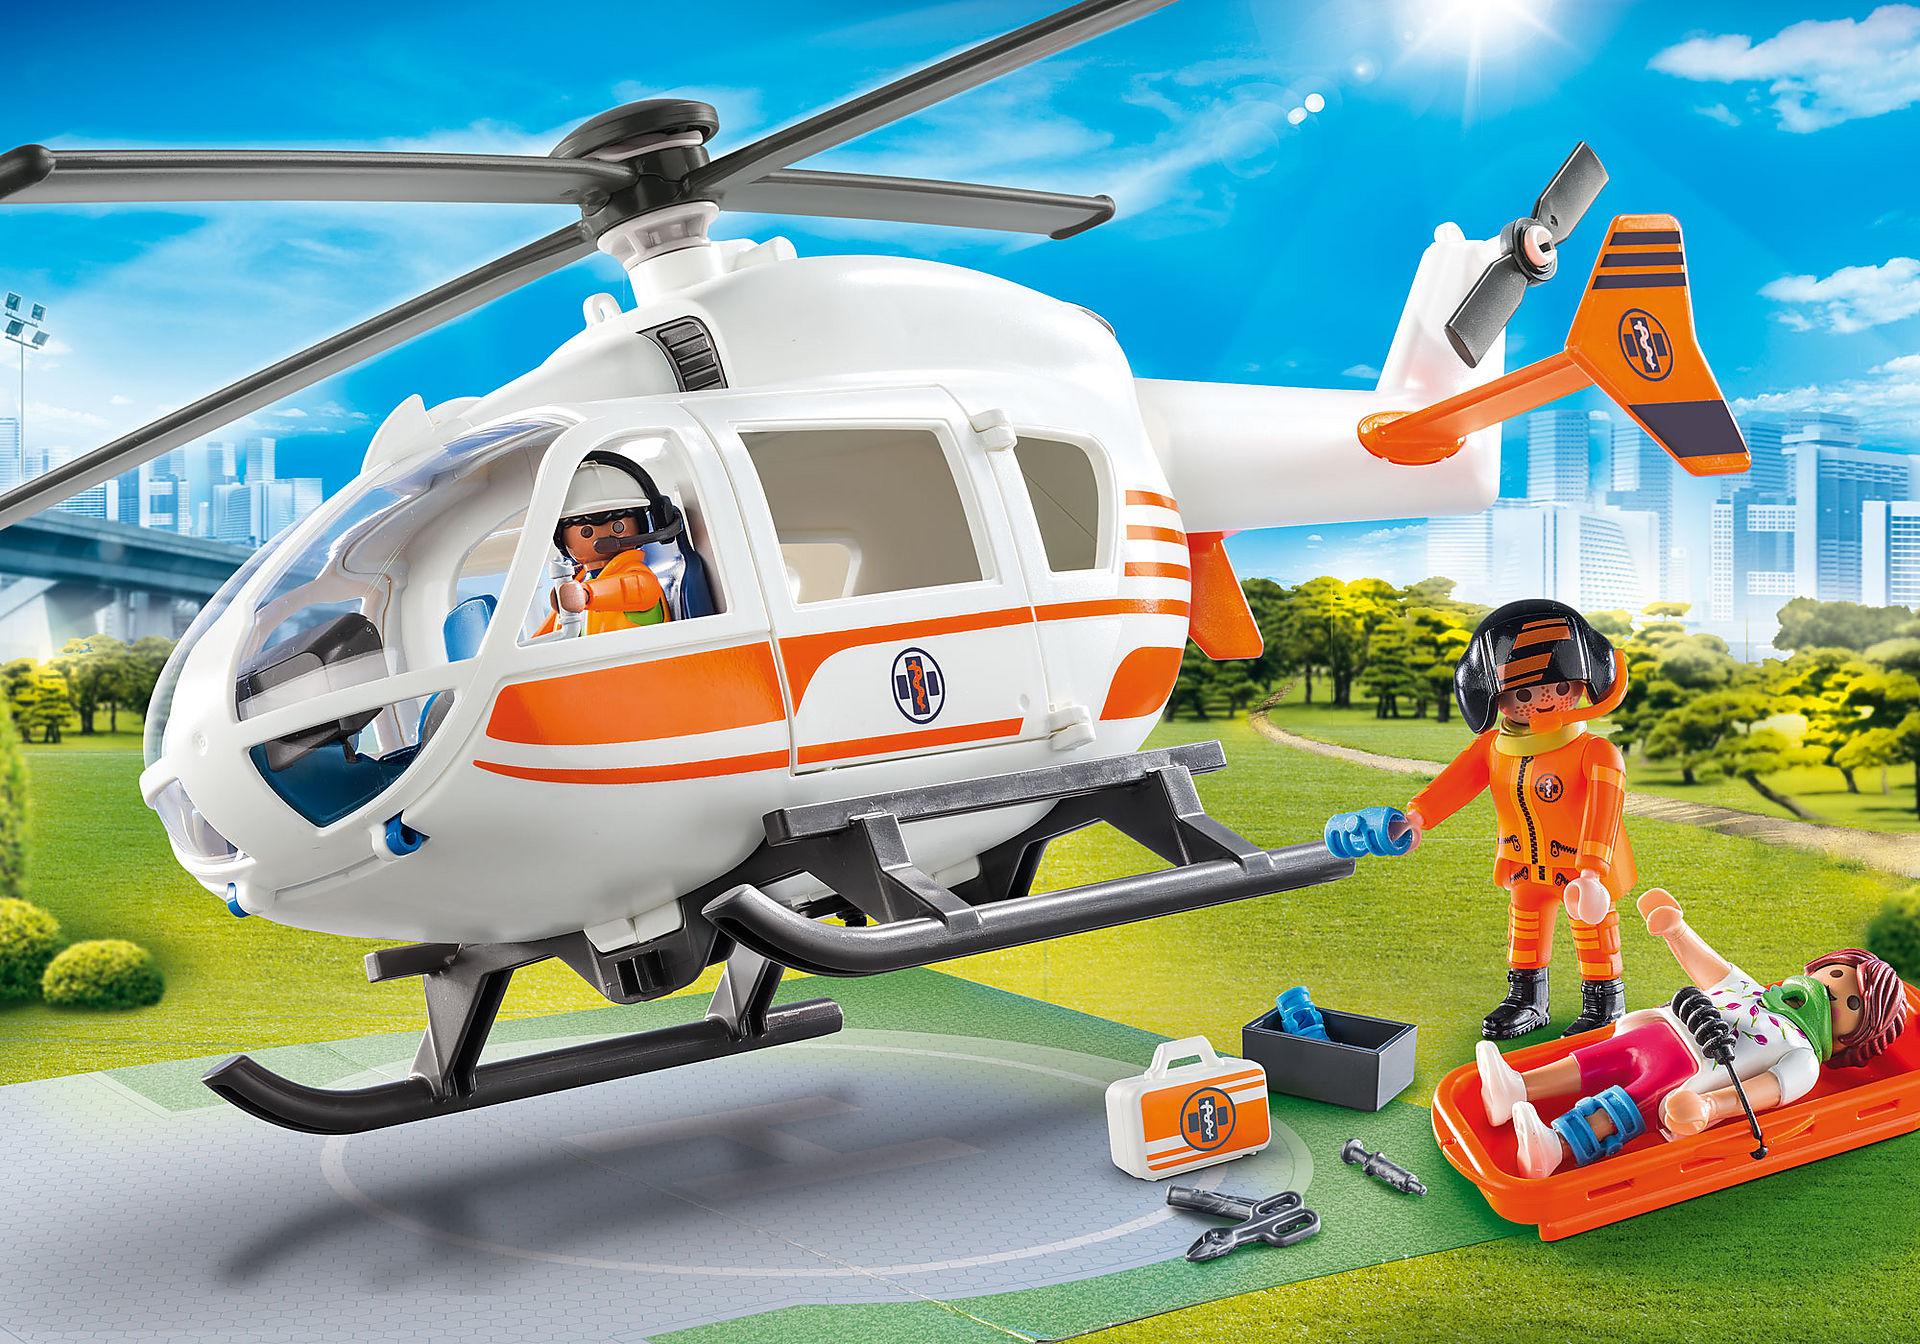 http://media.playmobil.com/i/playmobil/70048_product_detail/Räddningshelikopter